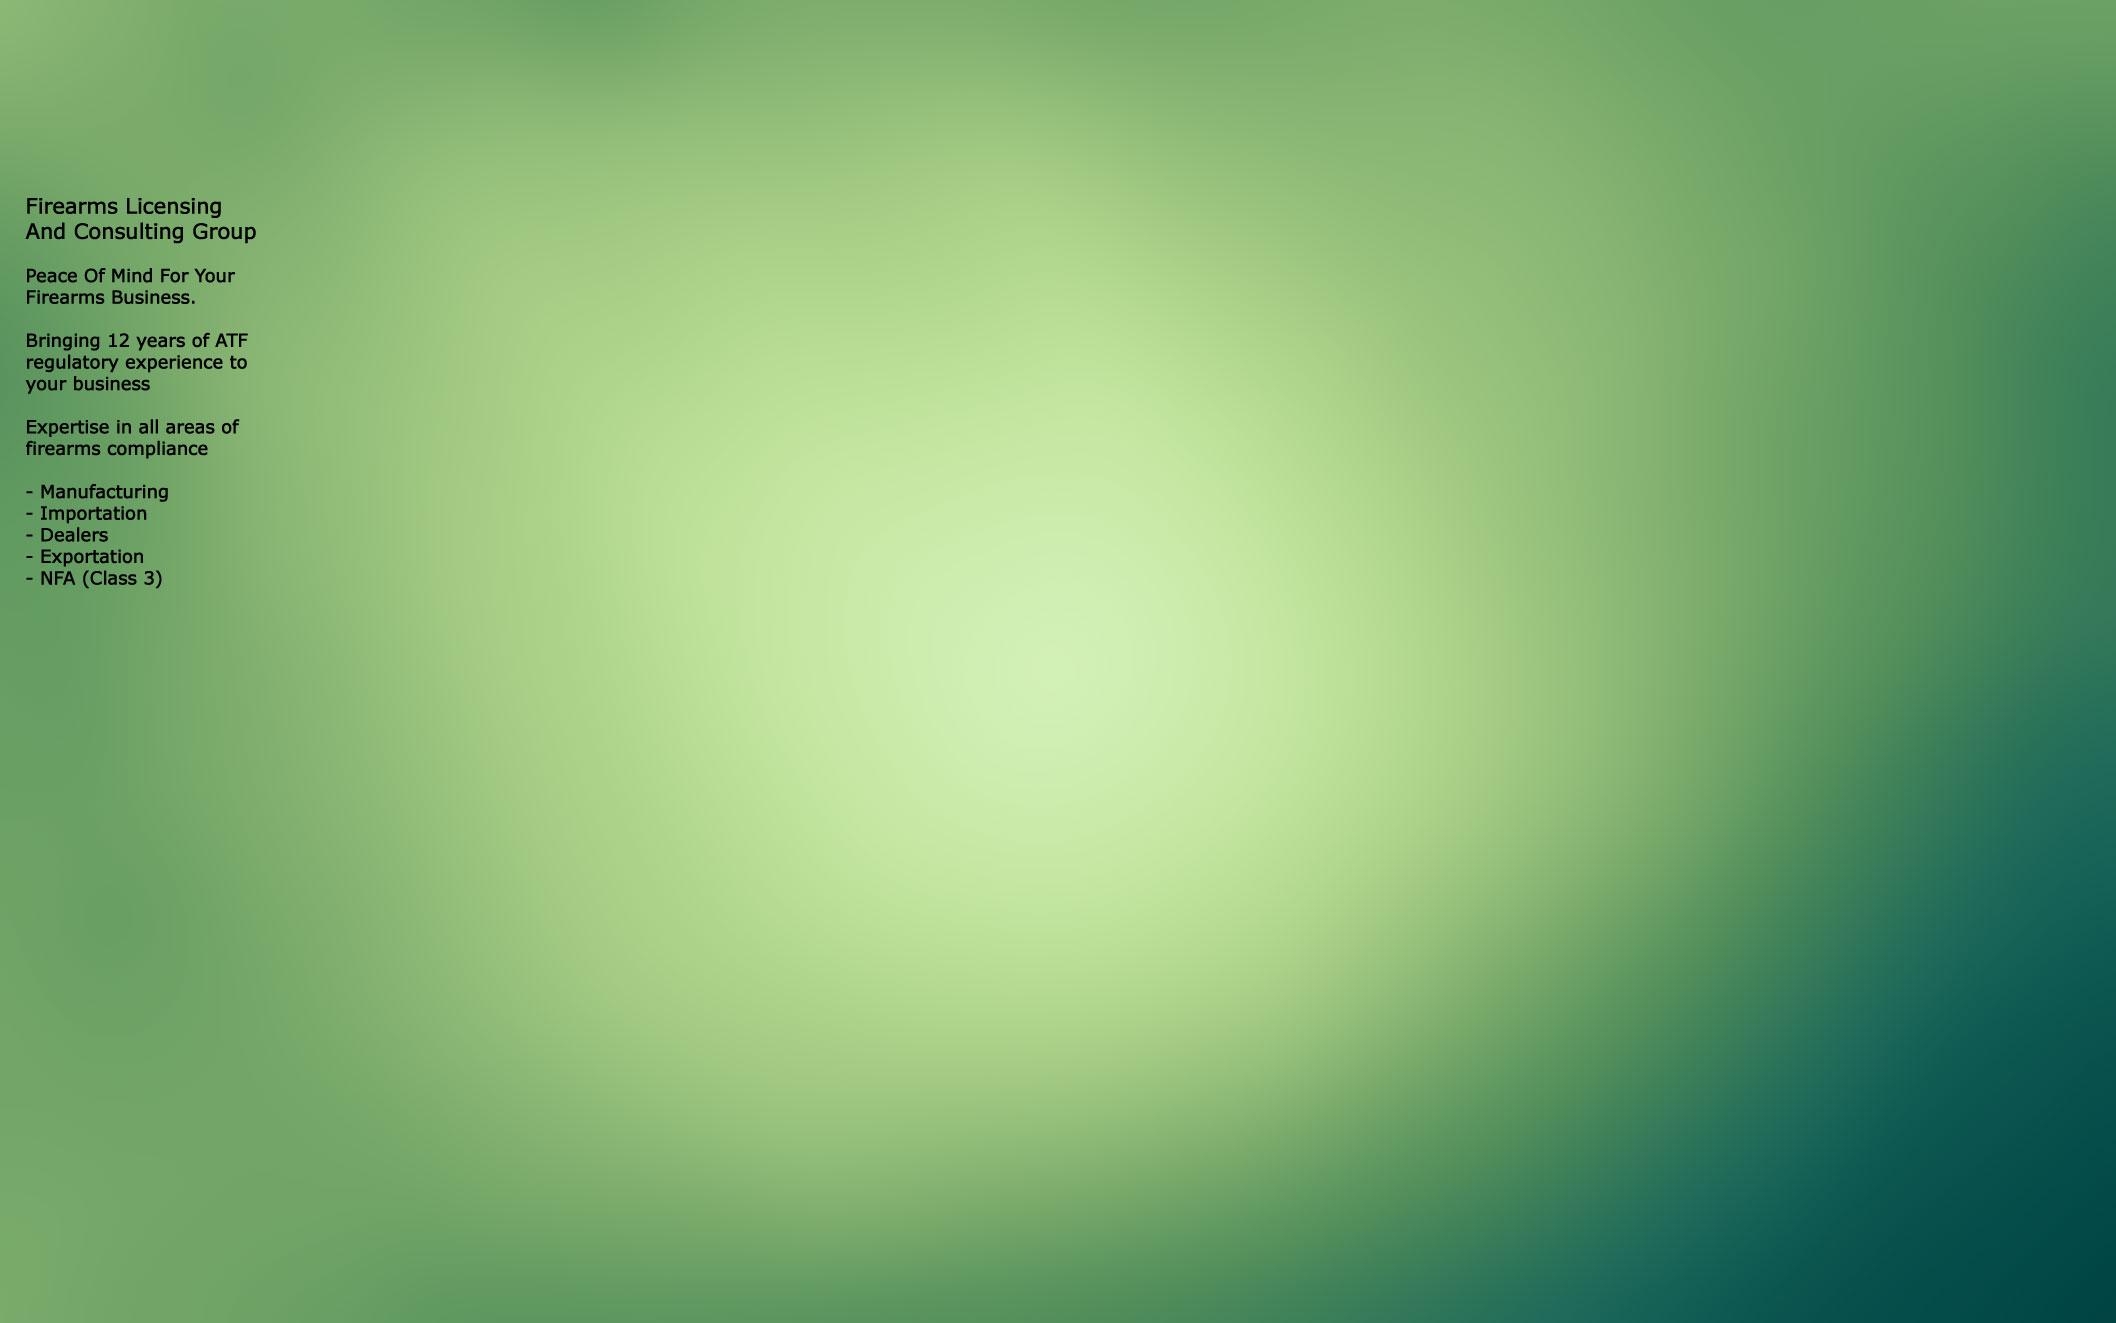 HD-Green-Background-July-23-2014-test-15.jpg